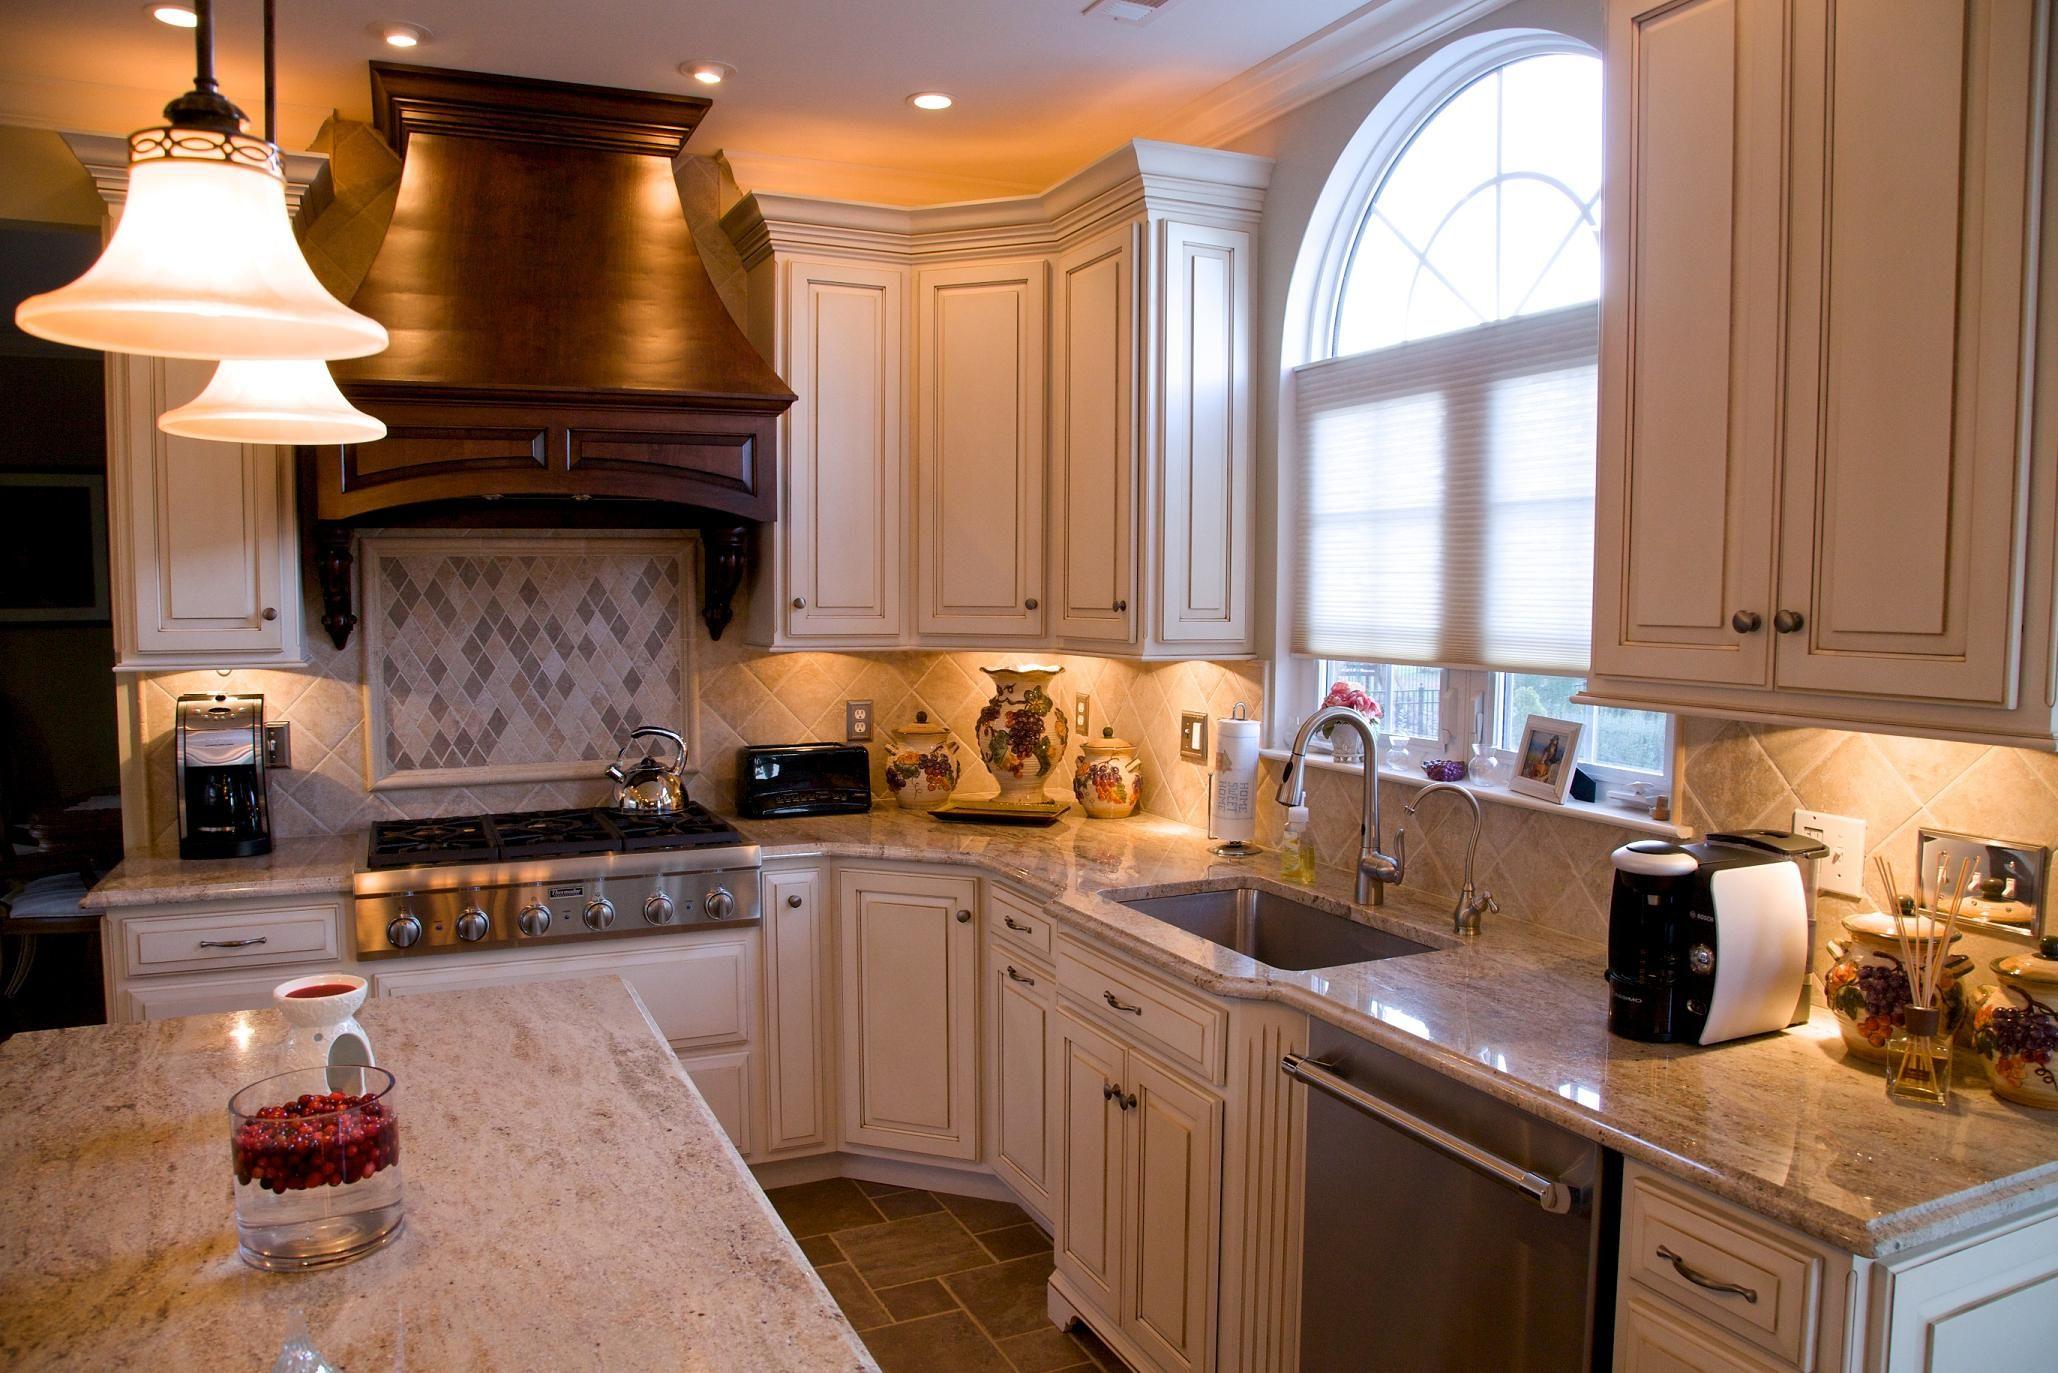 Kashmir Gold granite countertops with natural stone ... on Kitchen Backsplash Backsplash Ideas For Granite Countertops  id=86399